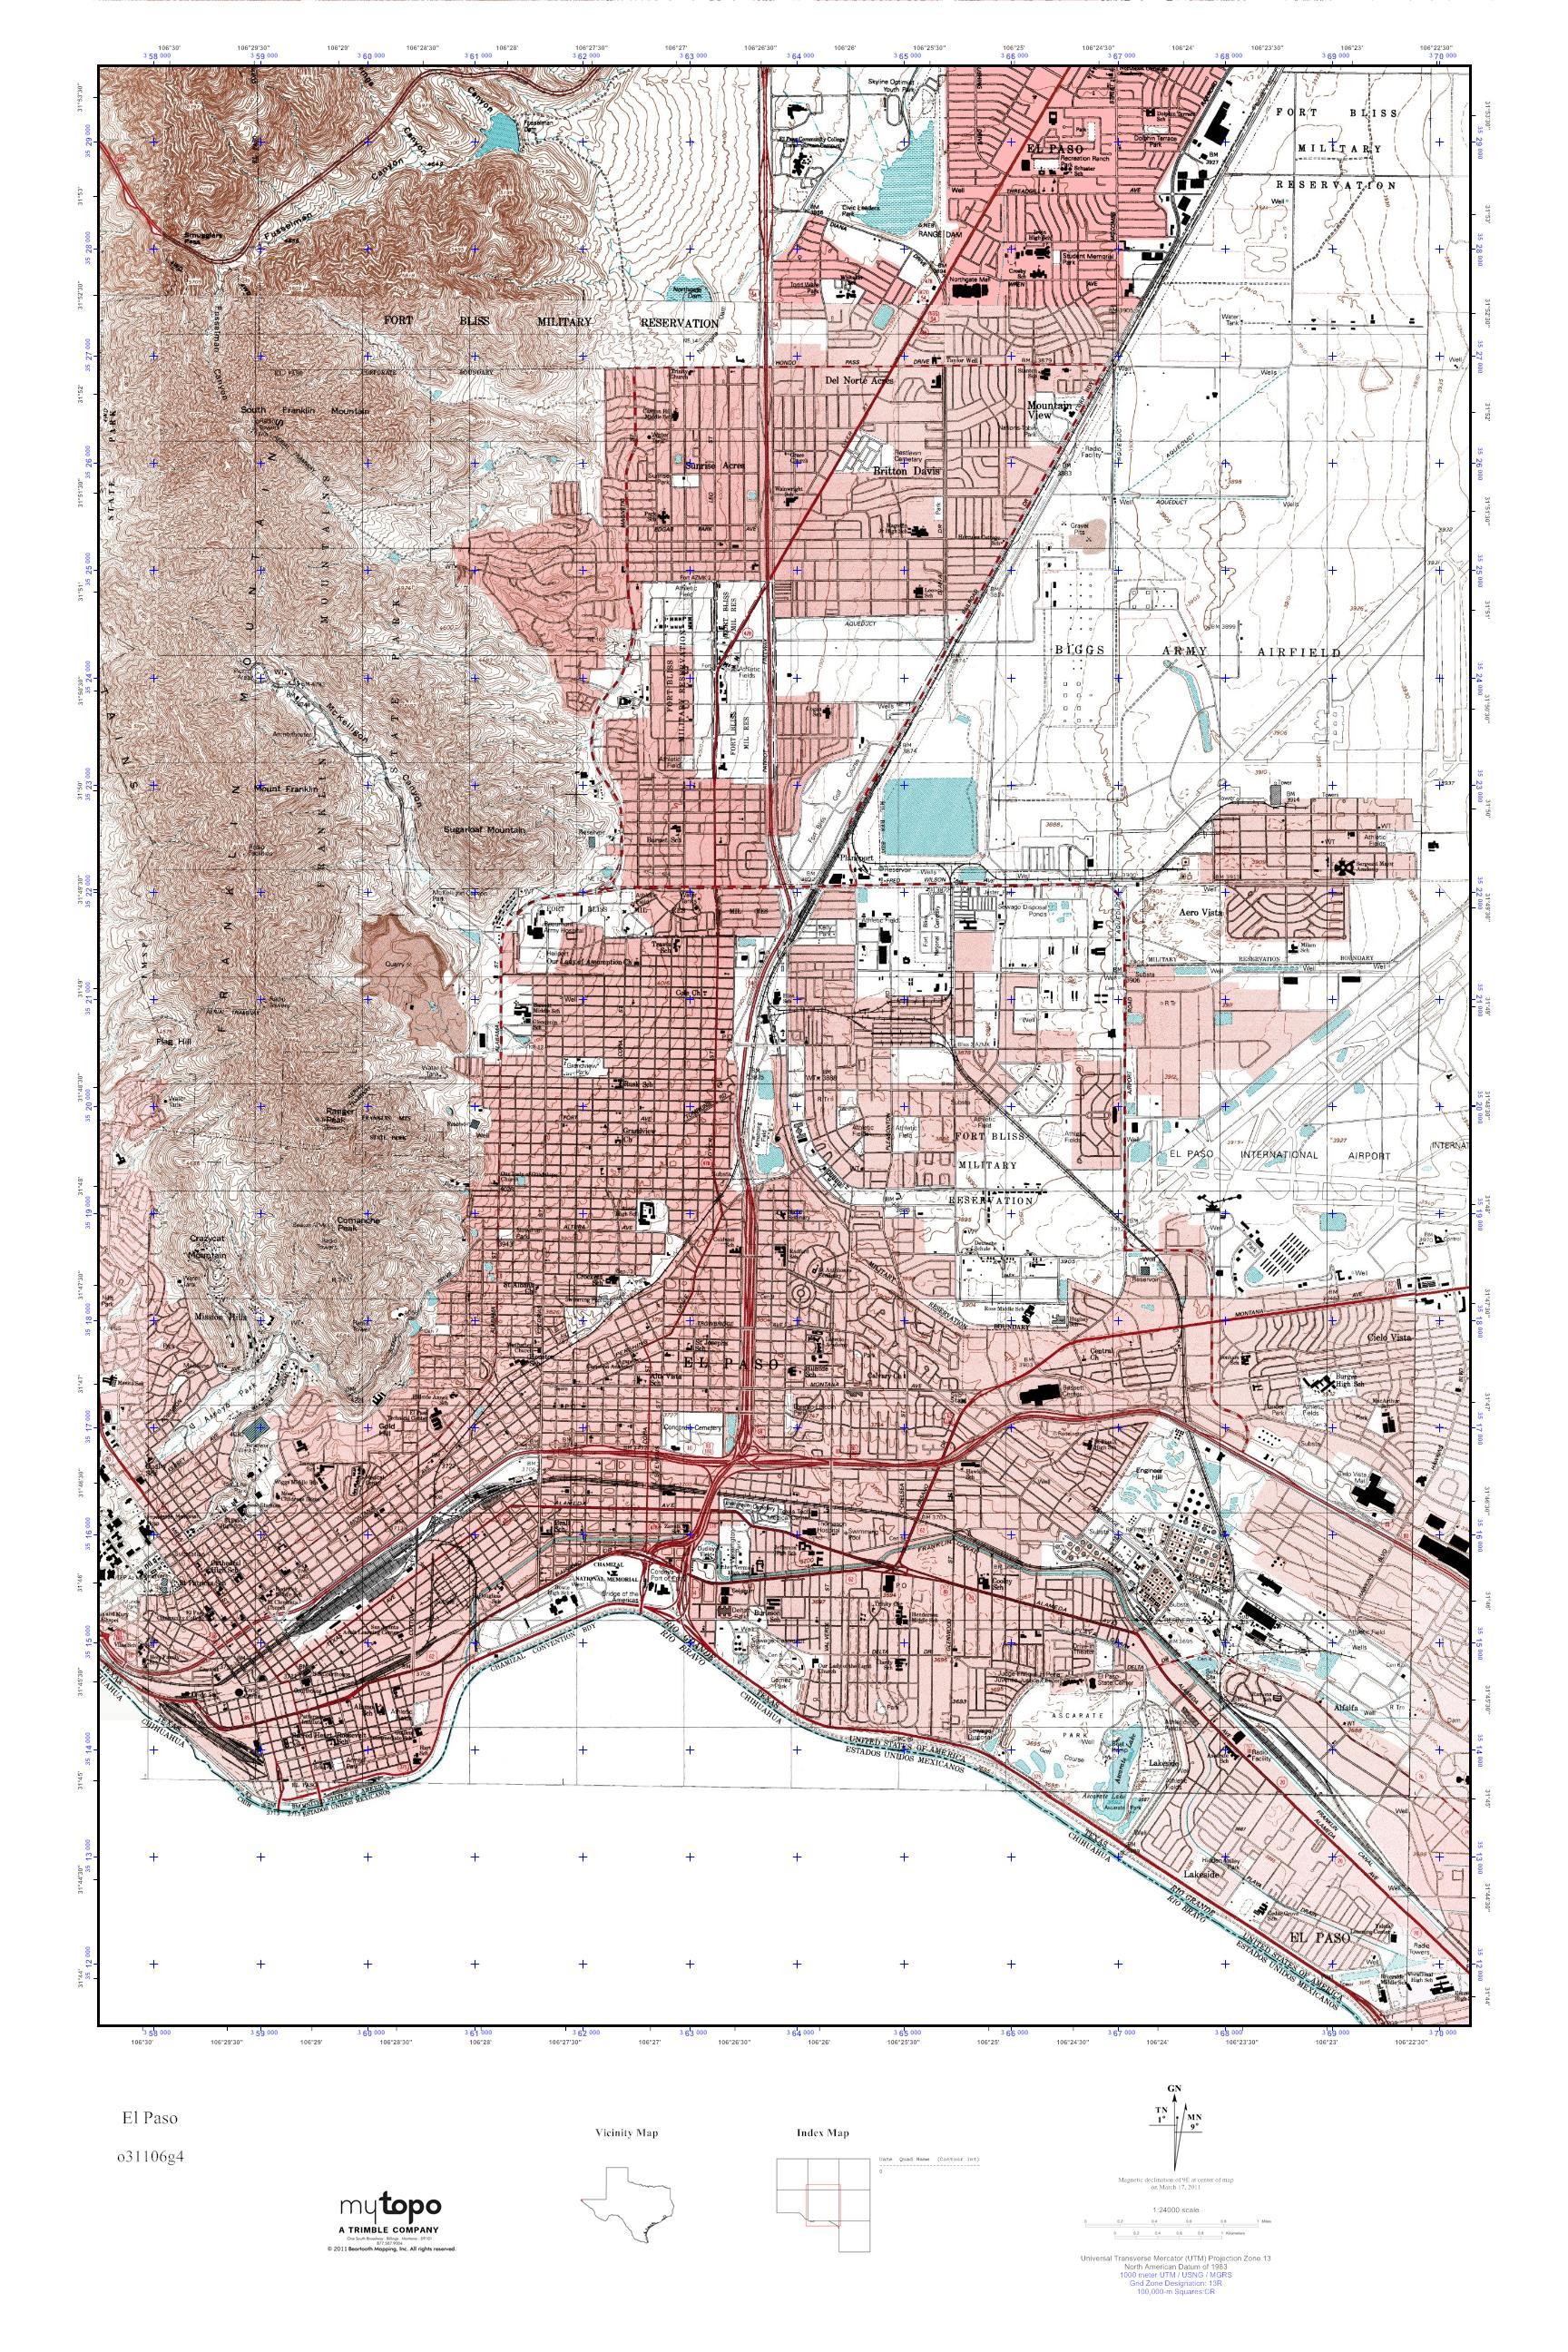 MyTopo El Paso, Texas USGS Quad Topo Map